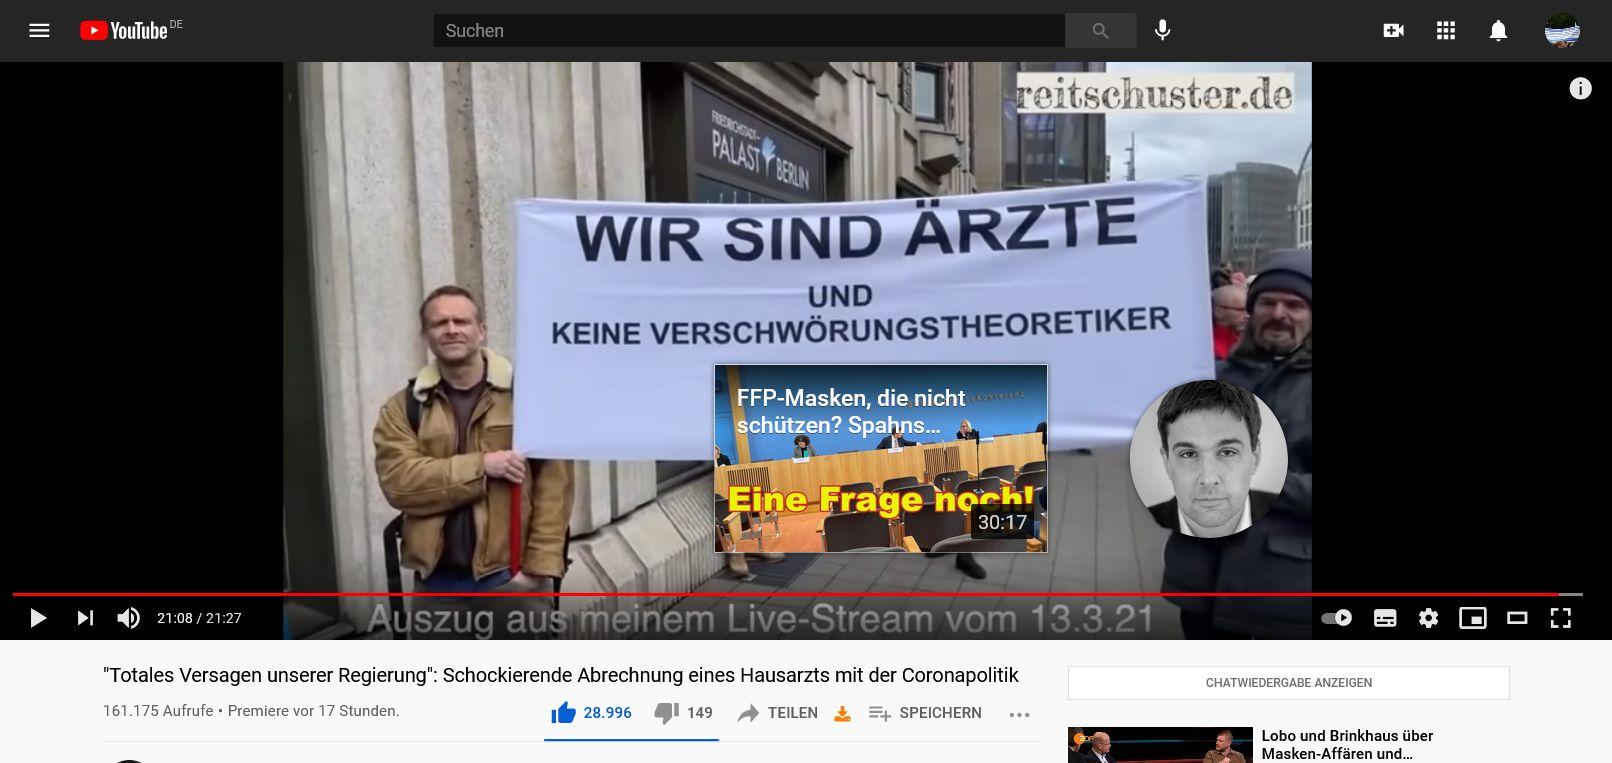 Youtube Alle